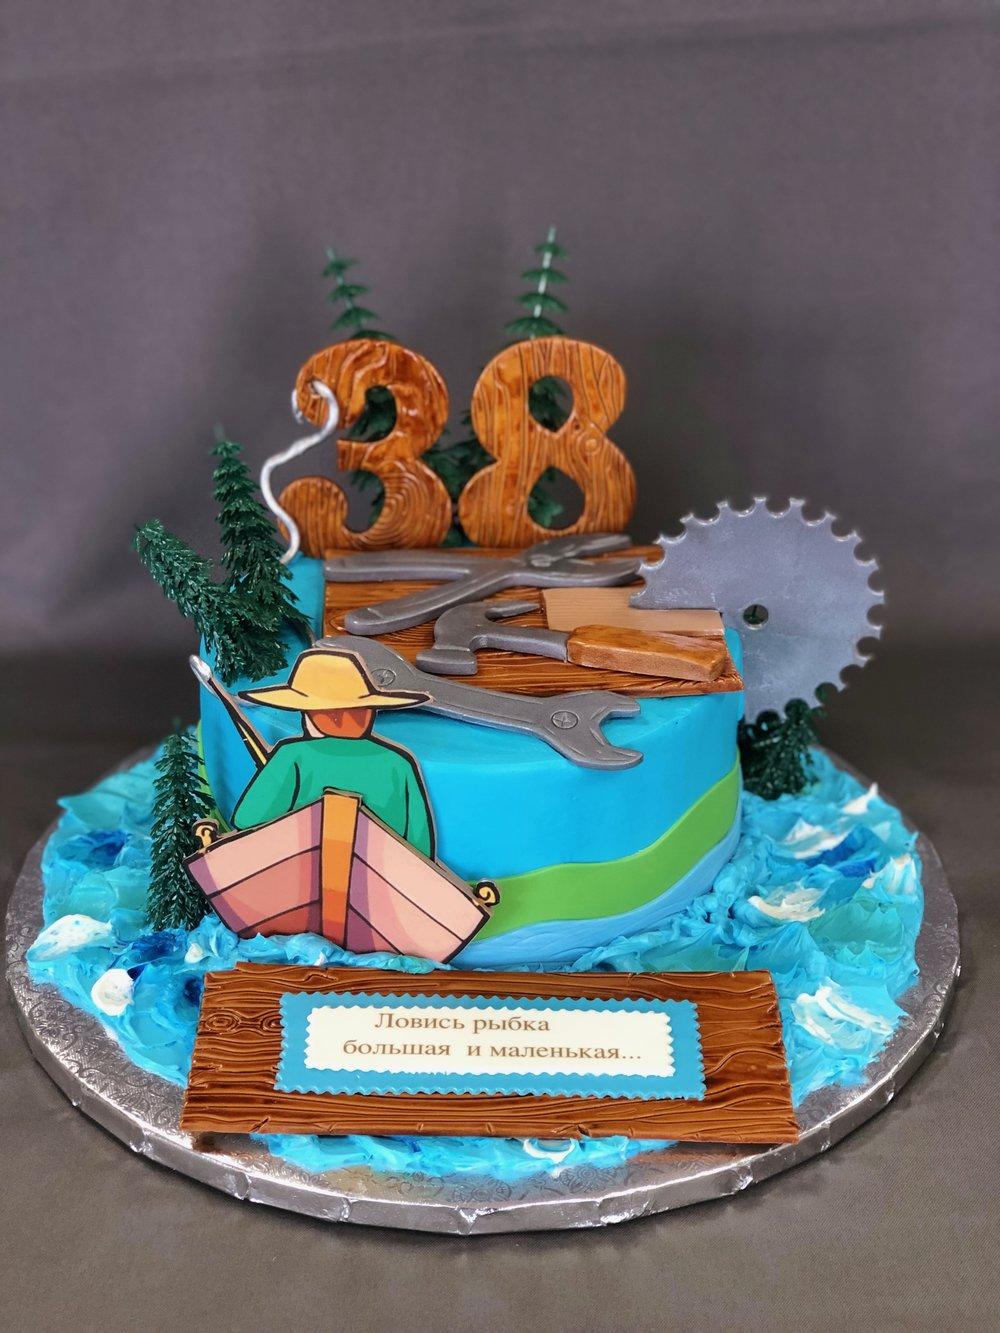 Handy Fisherman Birthday Cake NJ